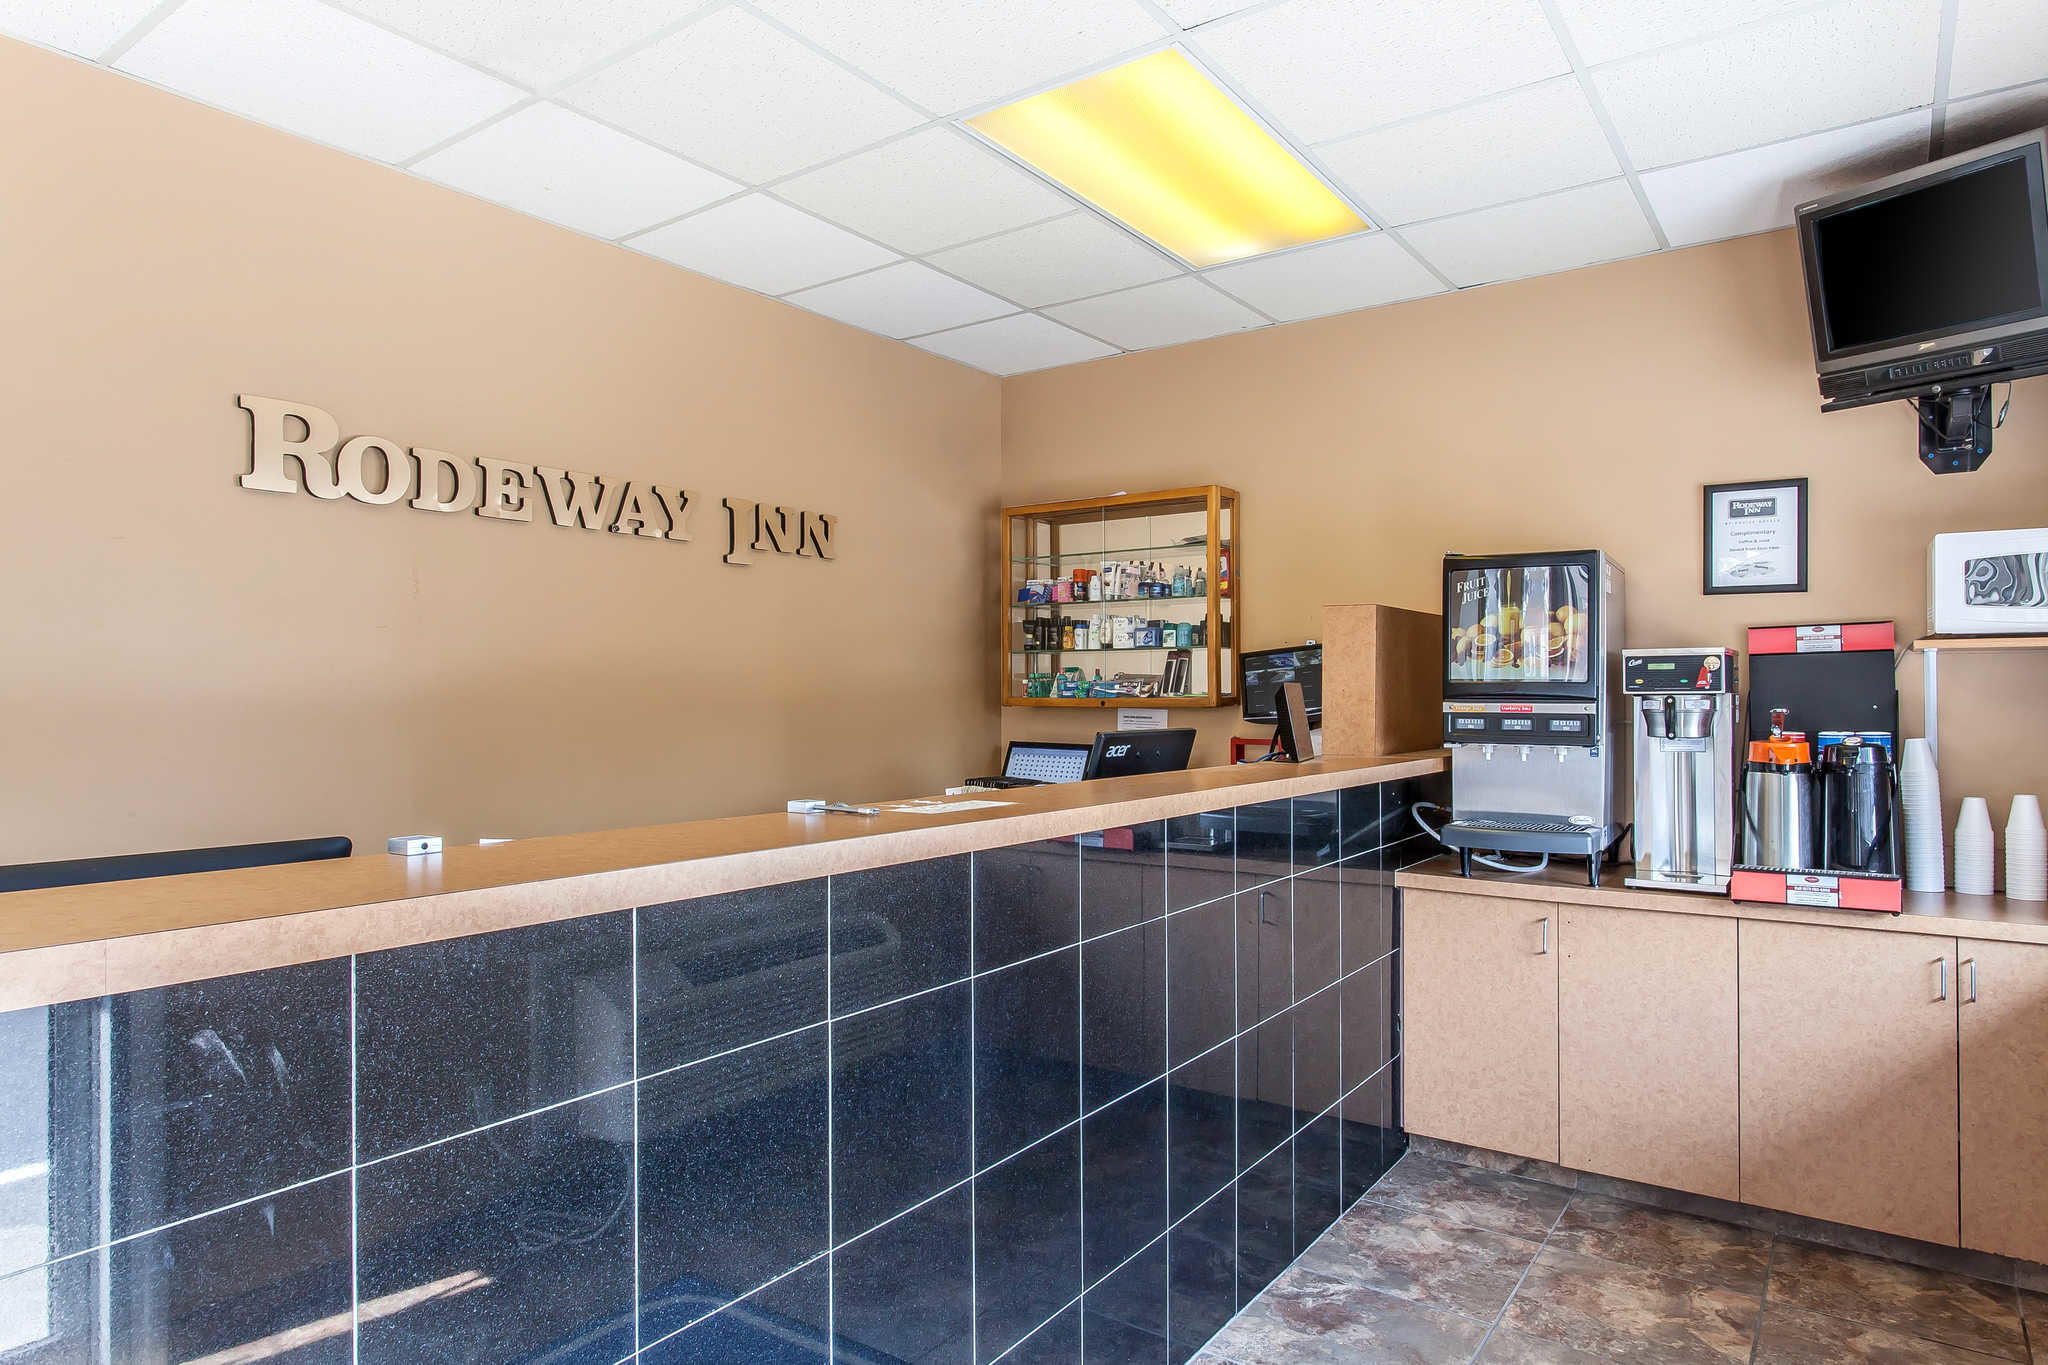 Rodeway Inn North image 35